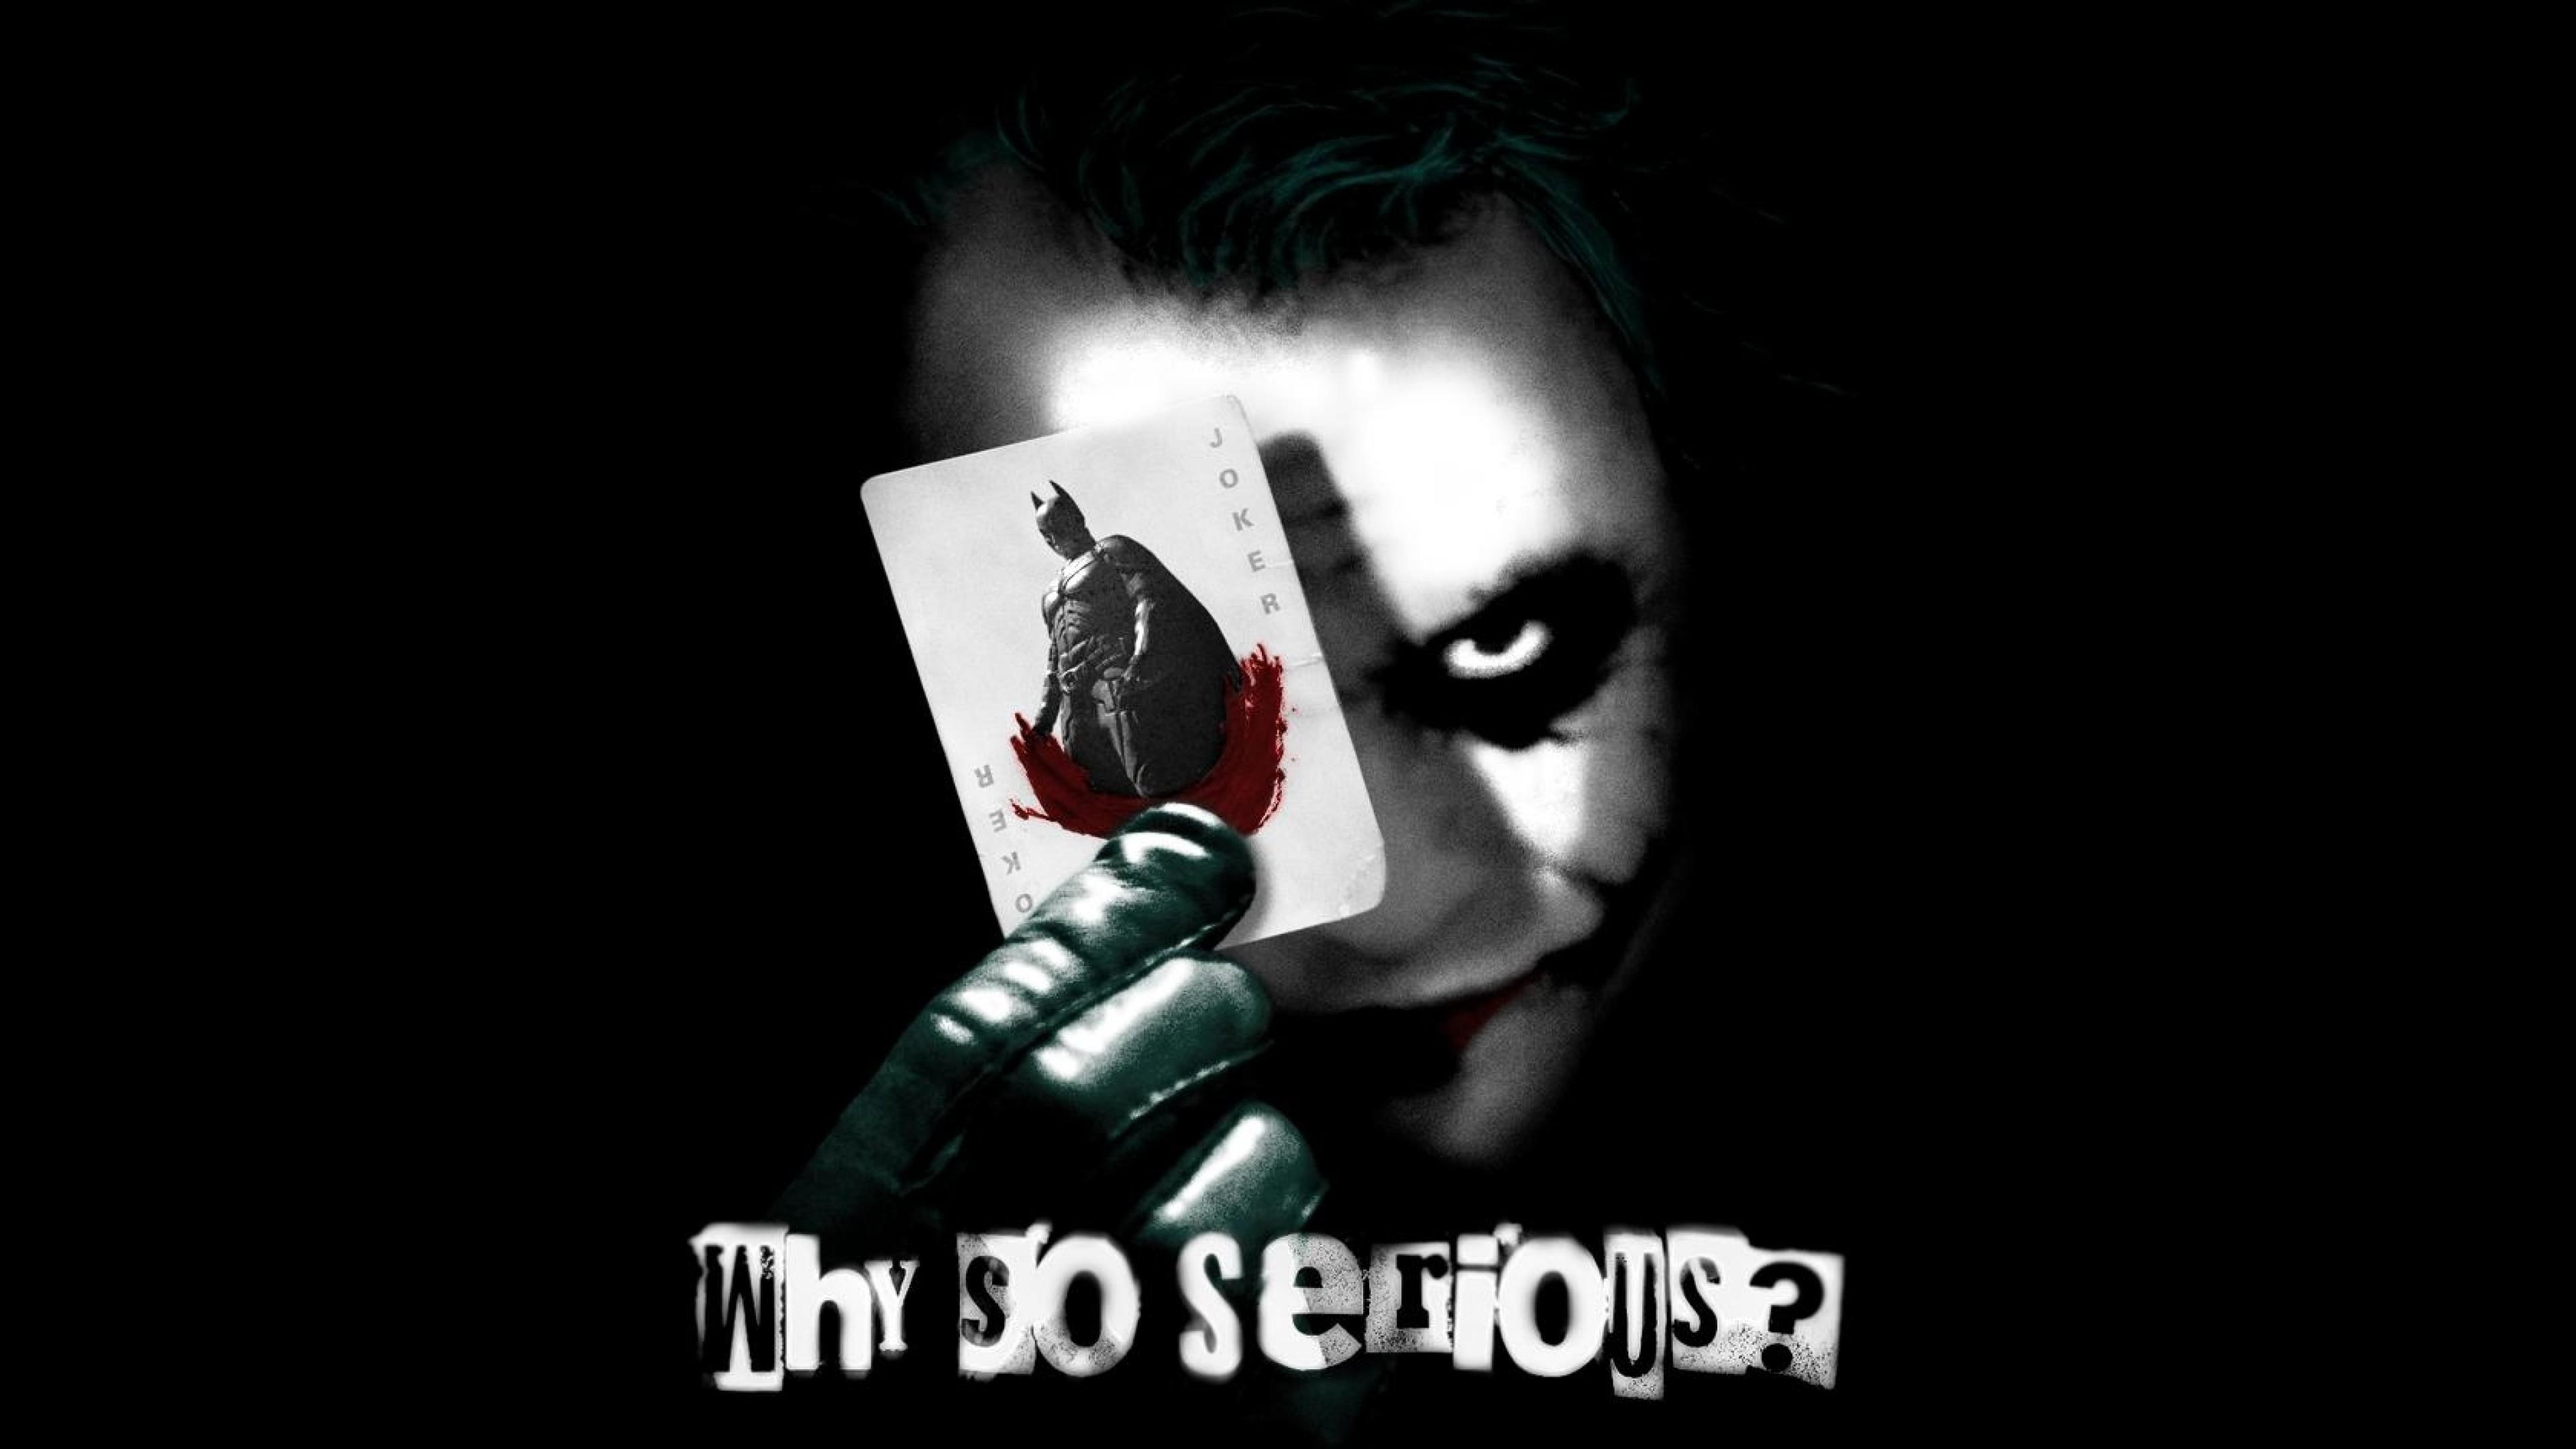 Joker Why So Serious Wallpaper ·① WallpaperTag